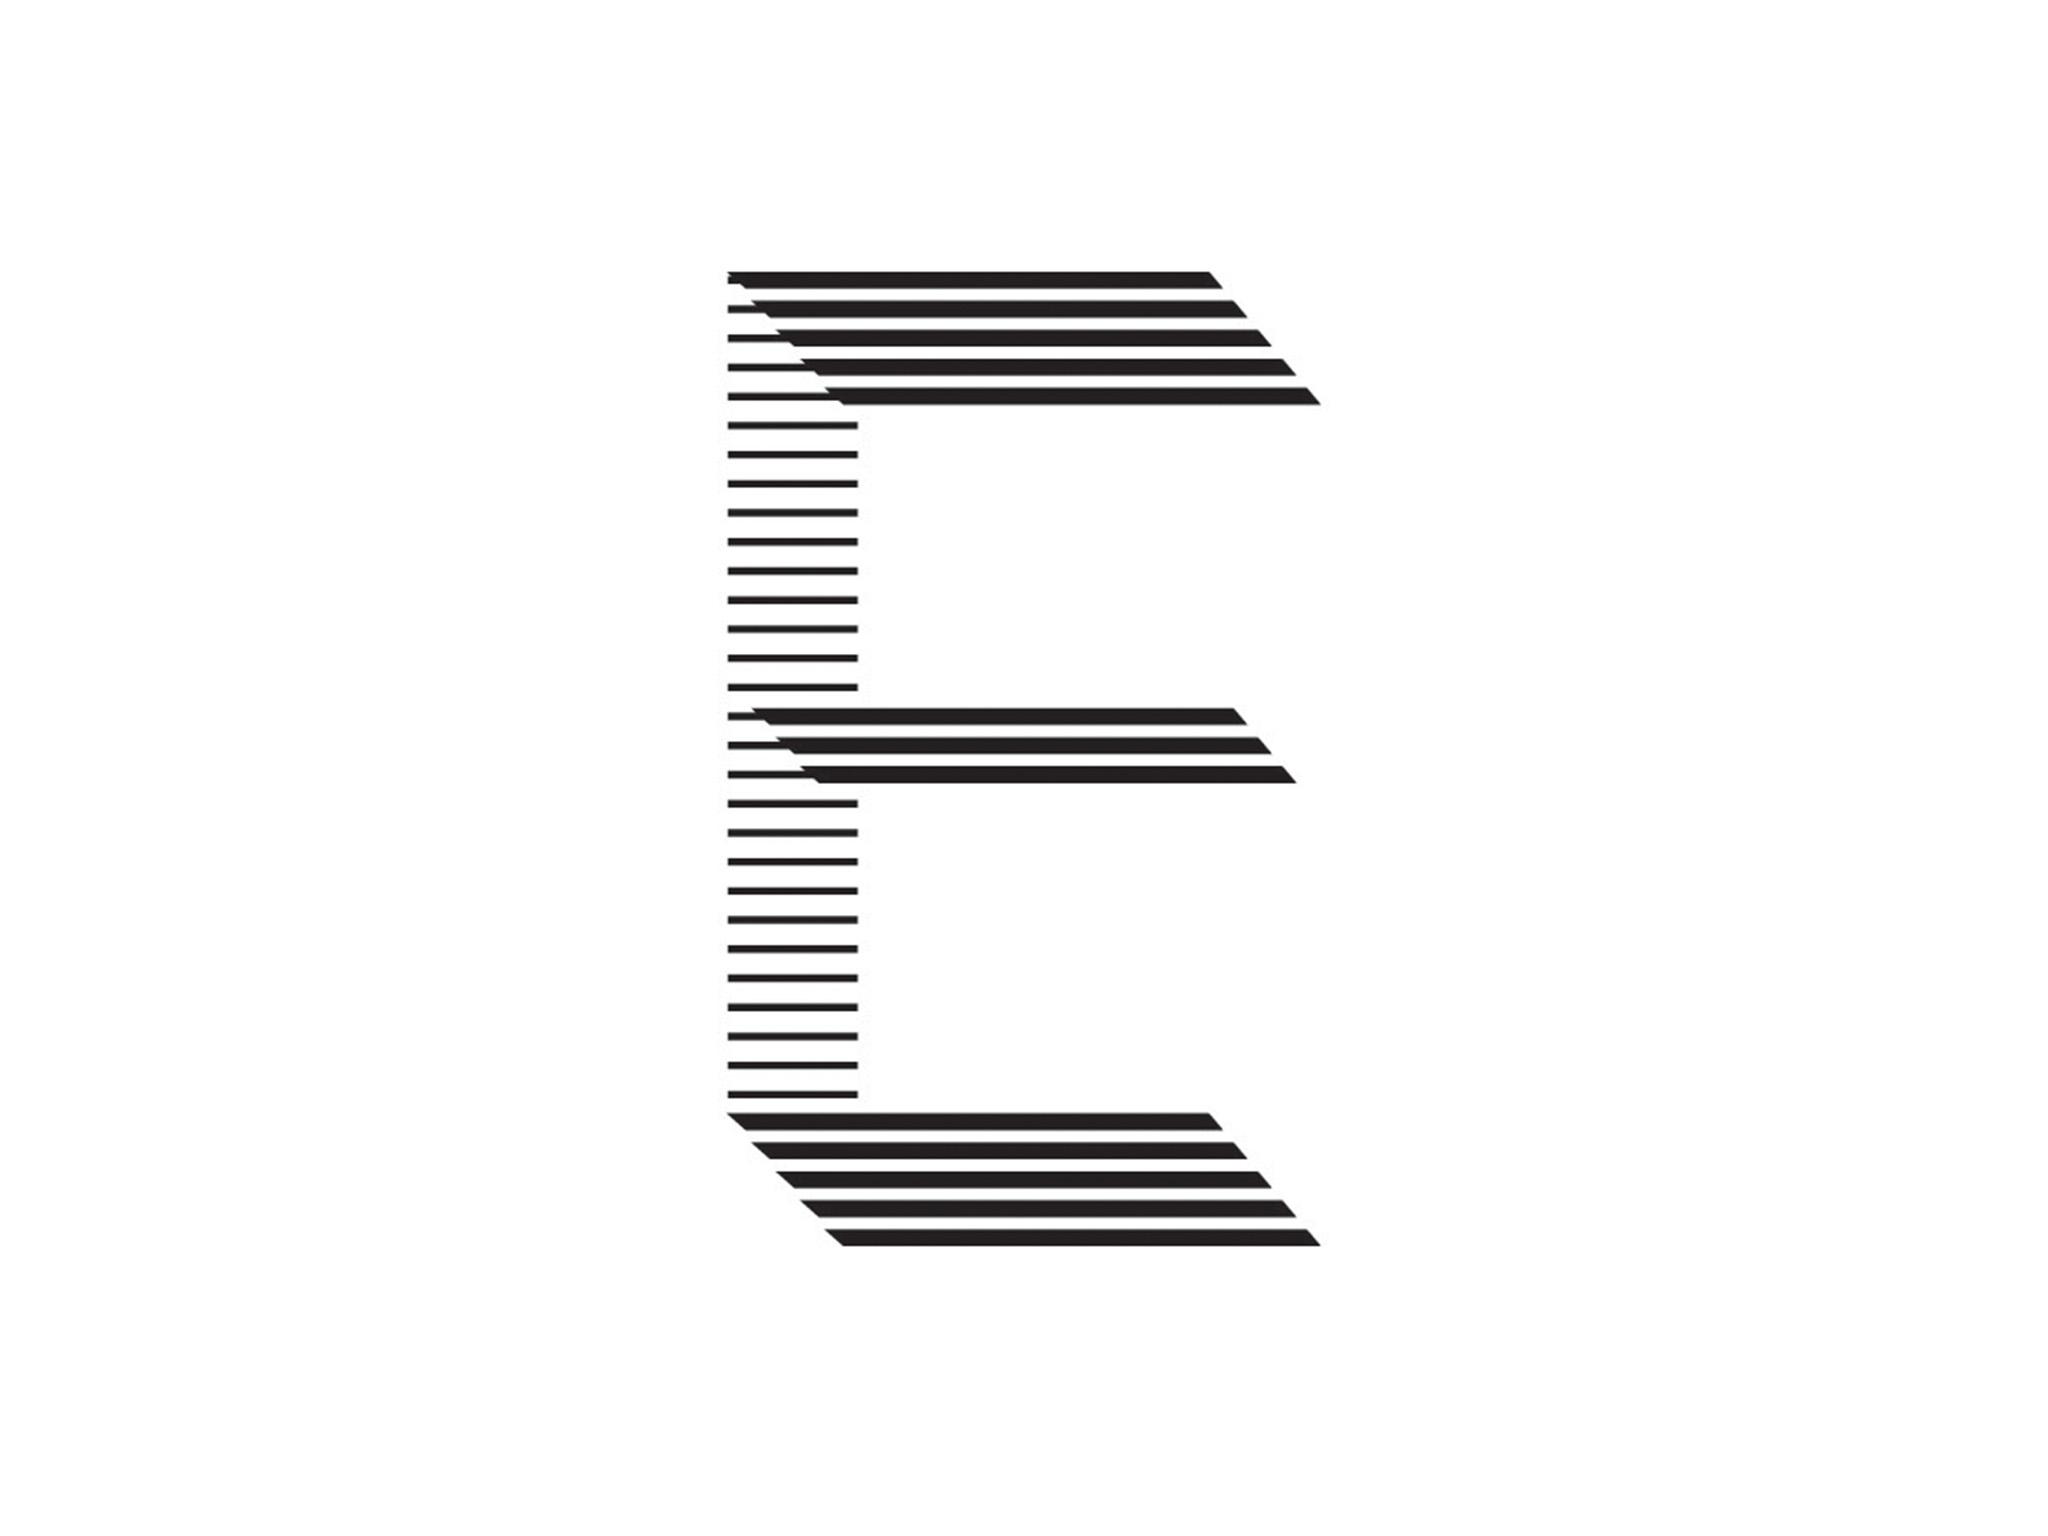 apex_letters_horizontal_large_0017_2_final_alphabet coasters-05.jpg